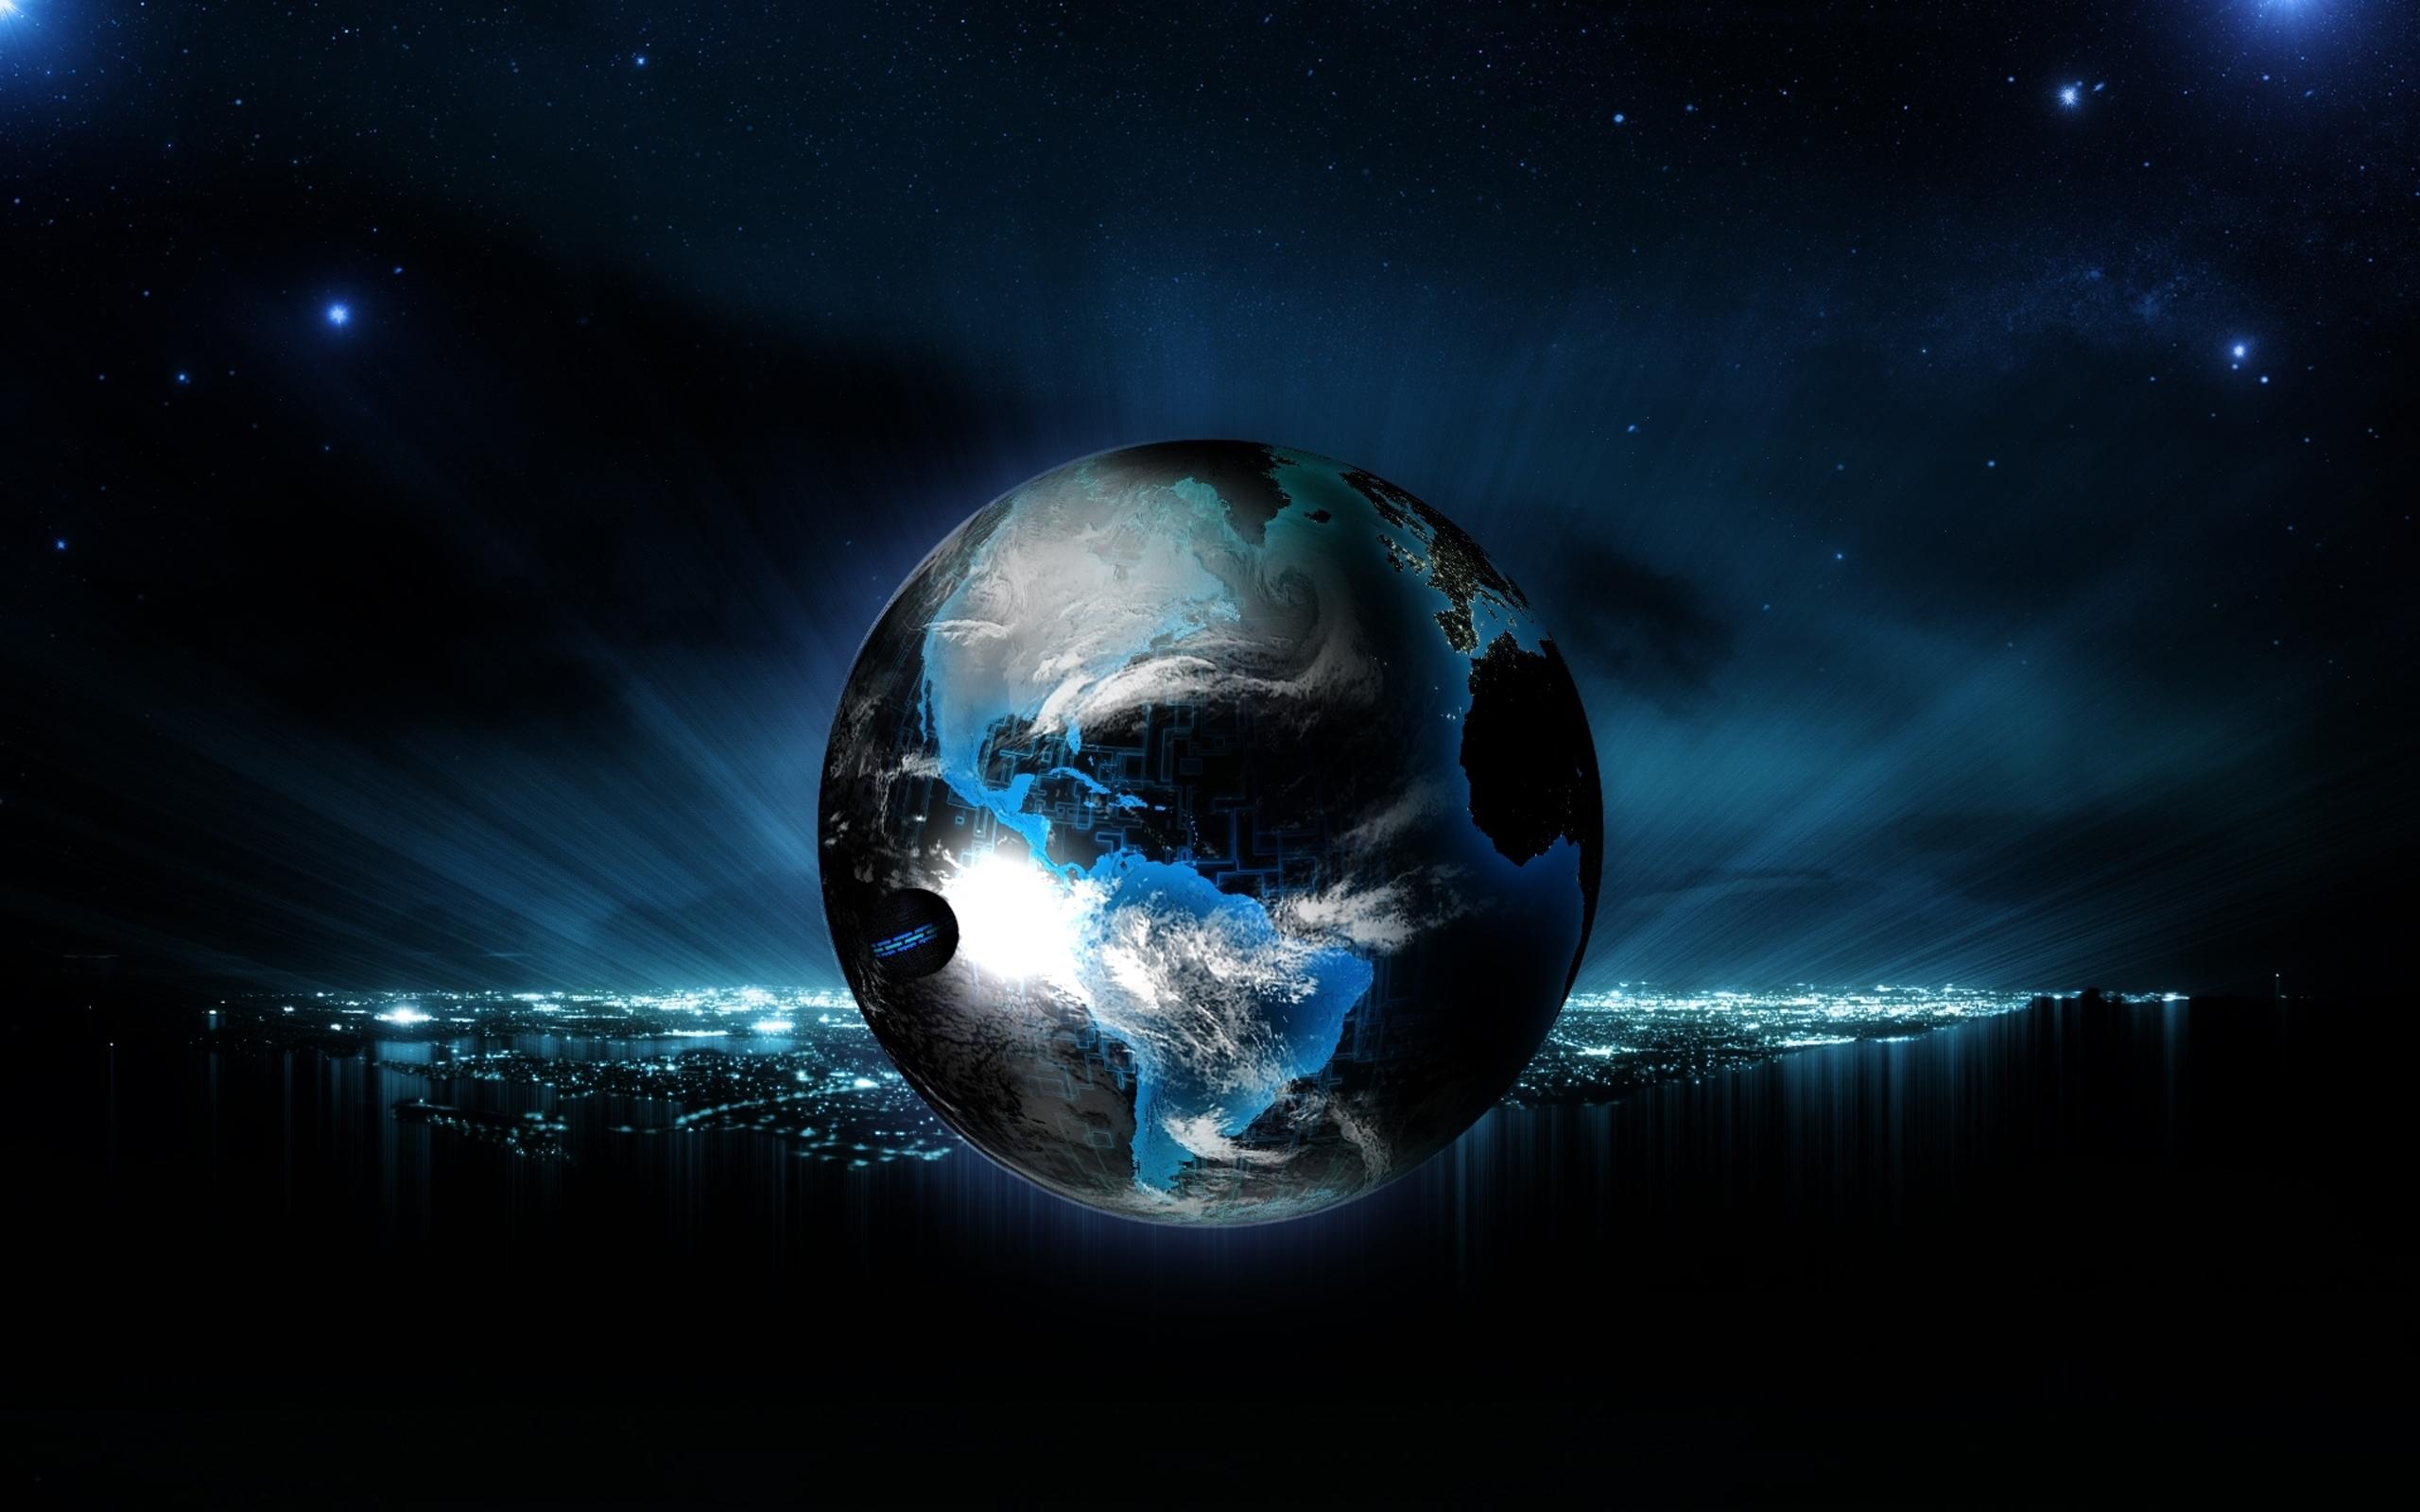 Earth Wallpaper Full Hd: Backgrounds - Wallpaper Abyss